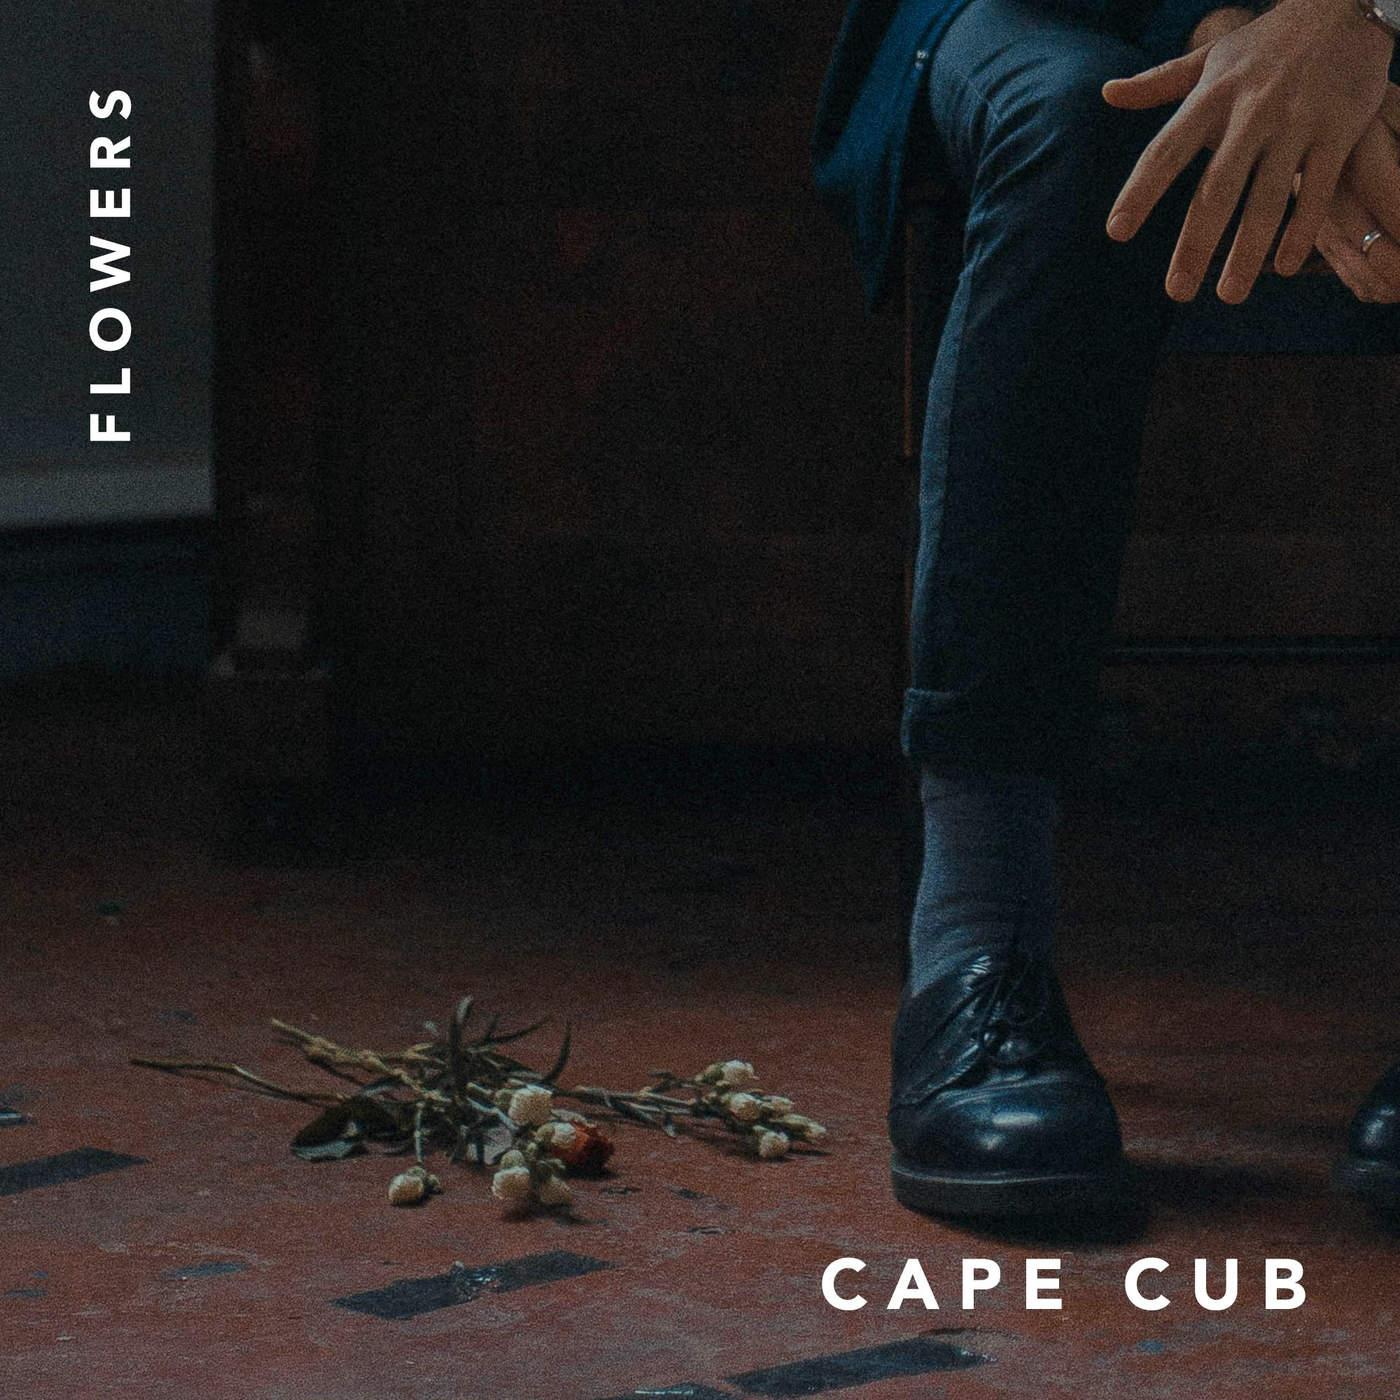 Cape Cub - Flowers - Single